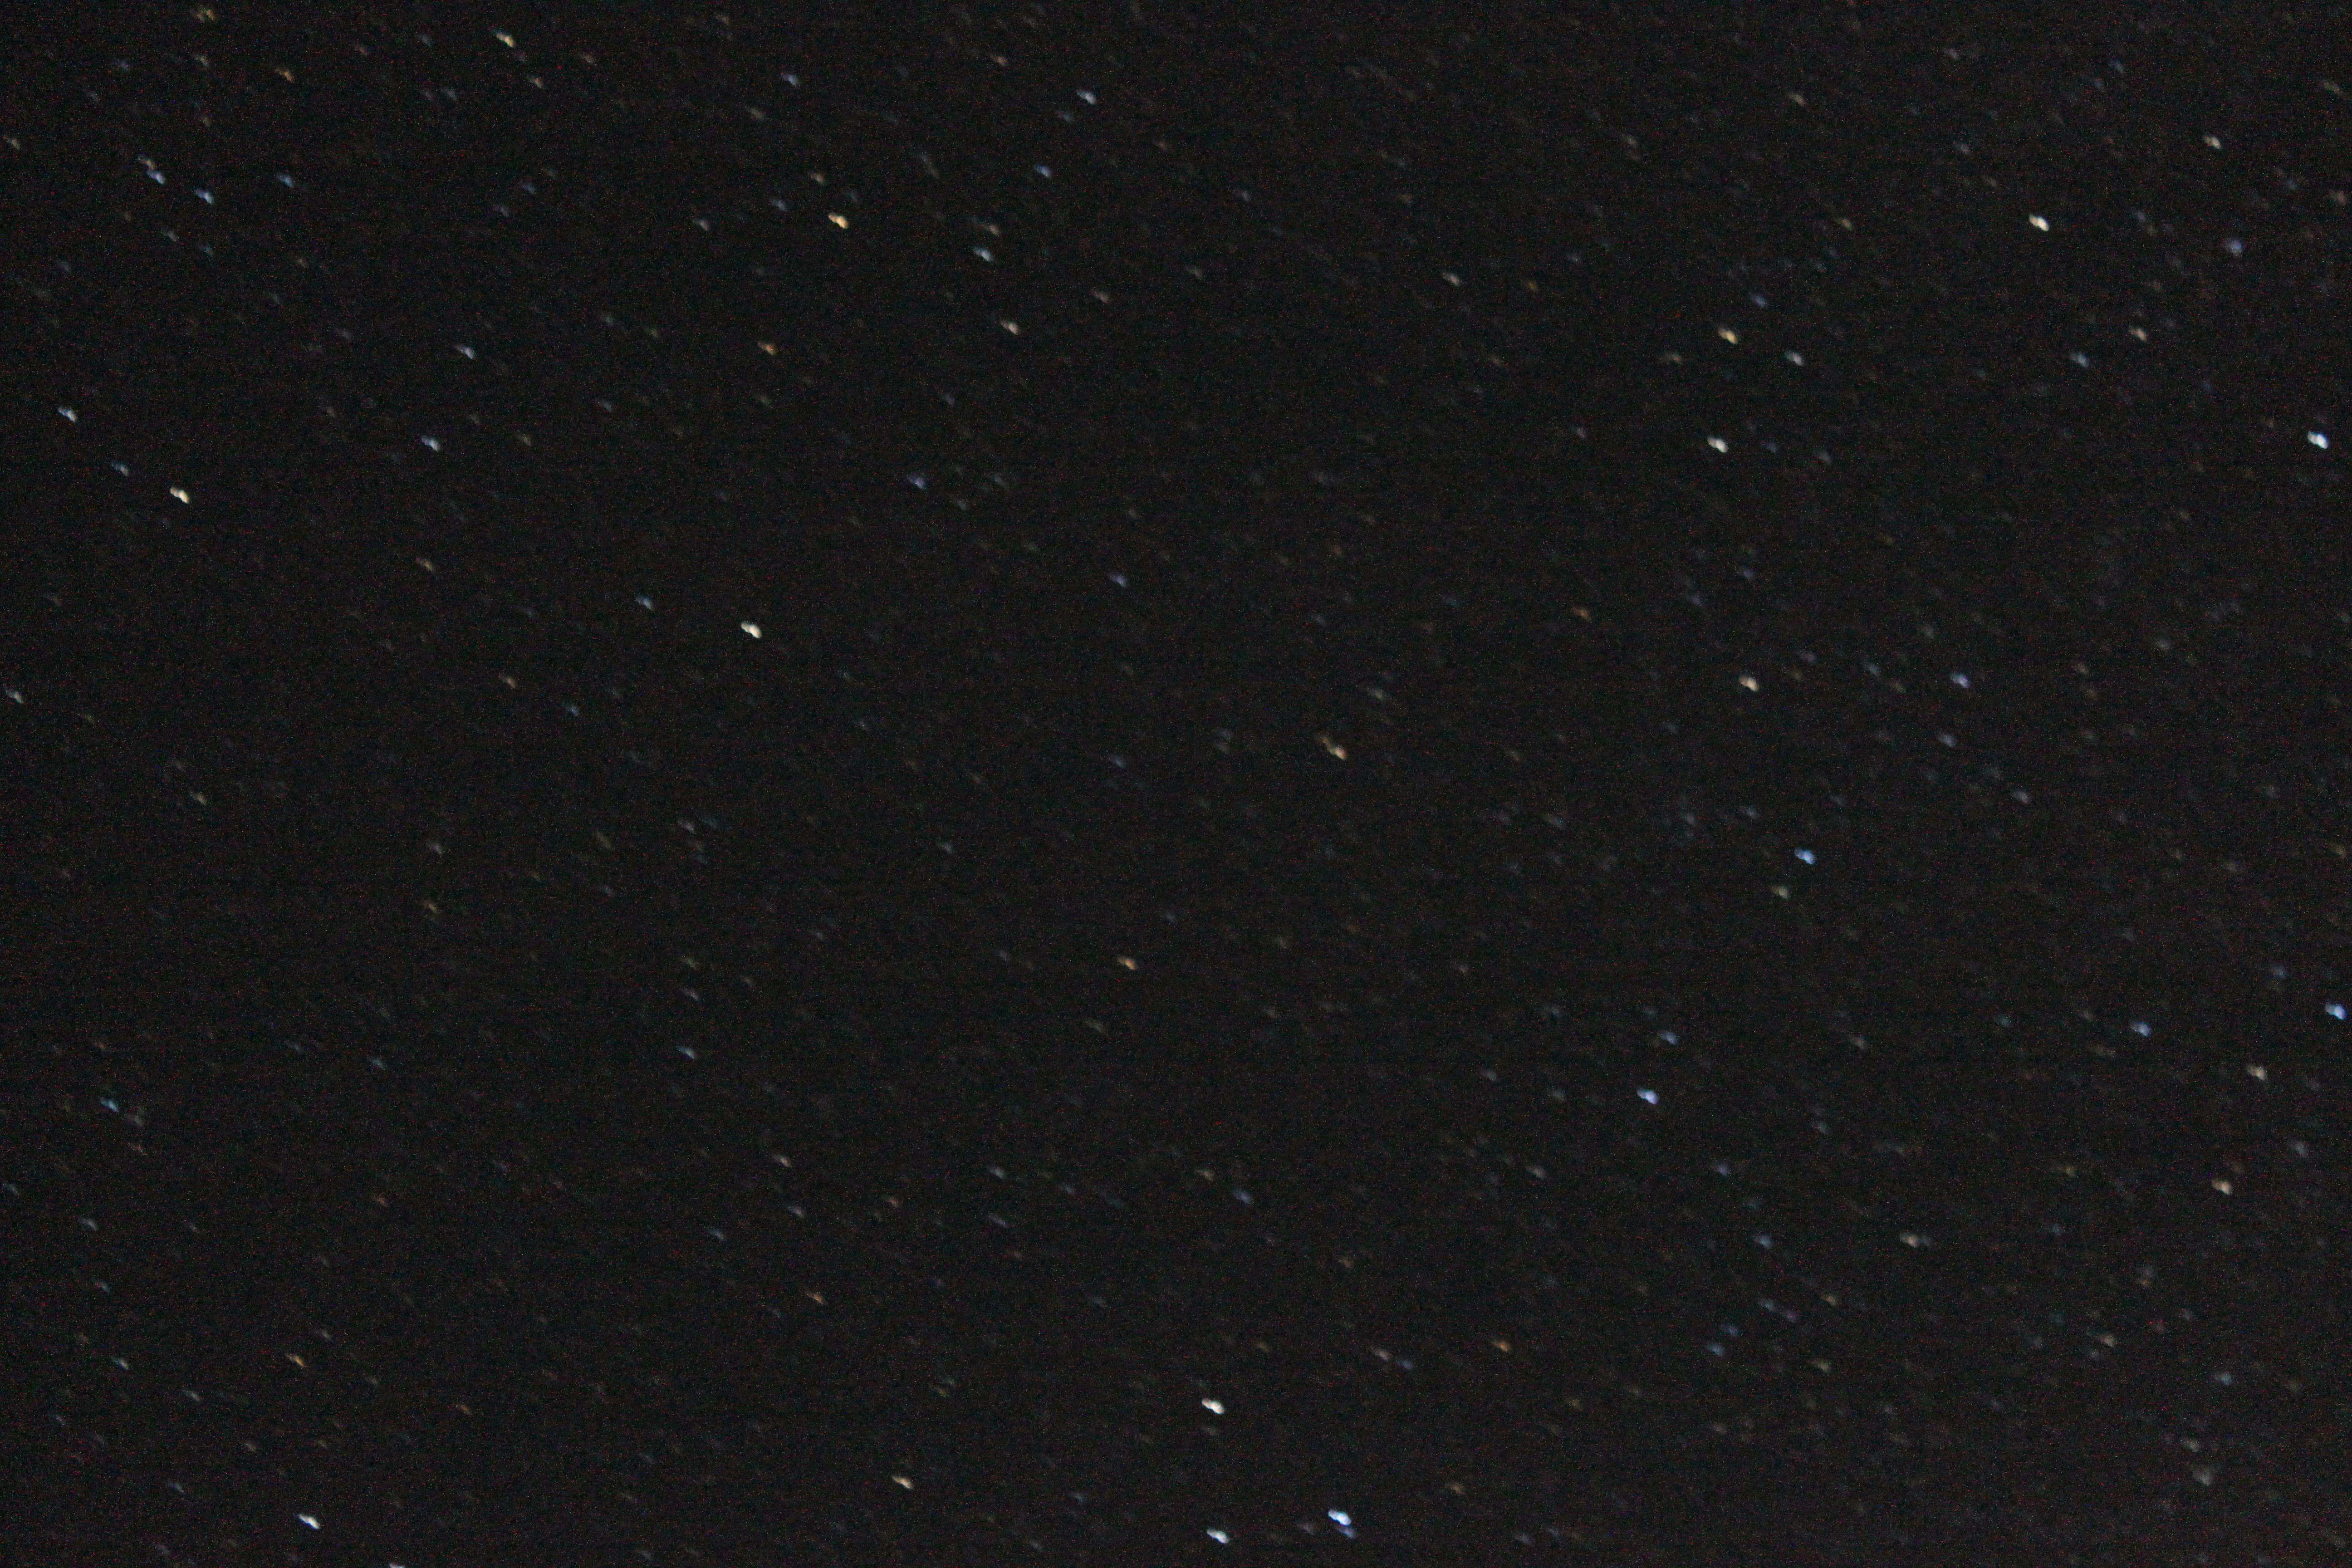 <b>露光時間を同じにしたまま、焦点距離を変えて撮影。55mm</b>